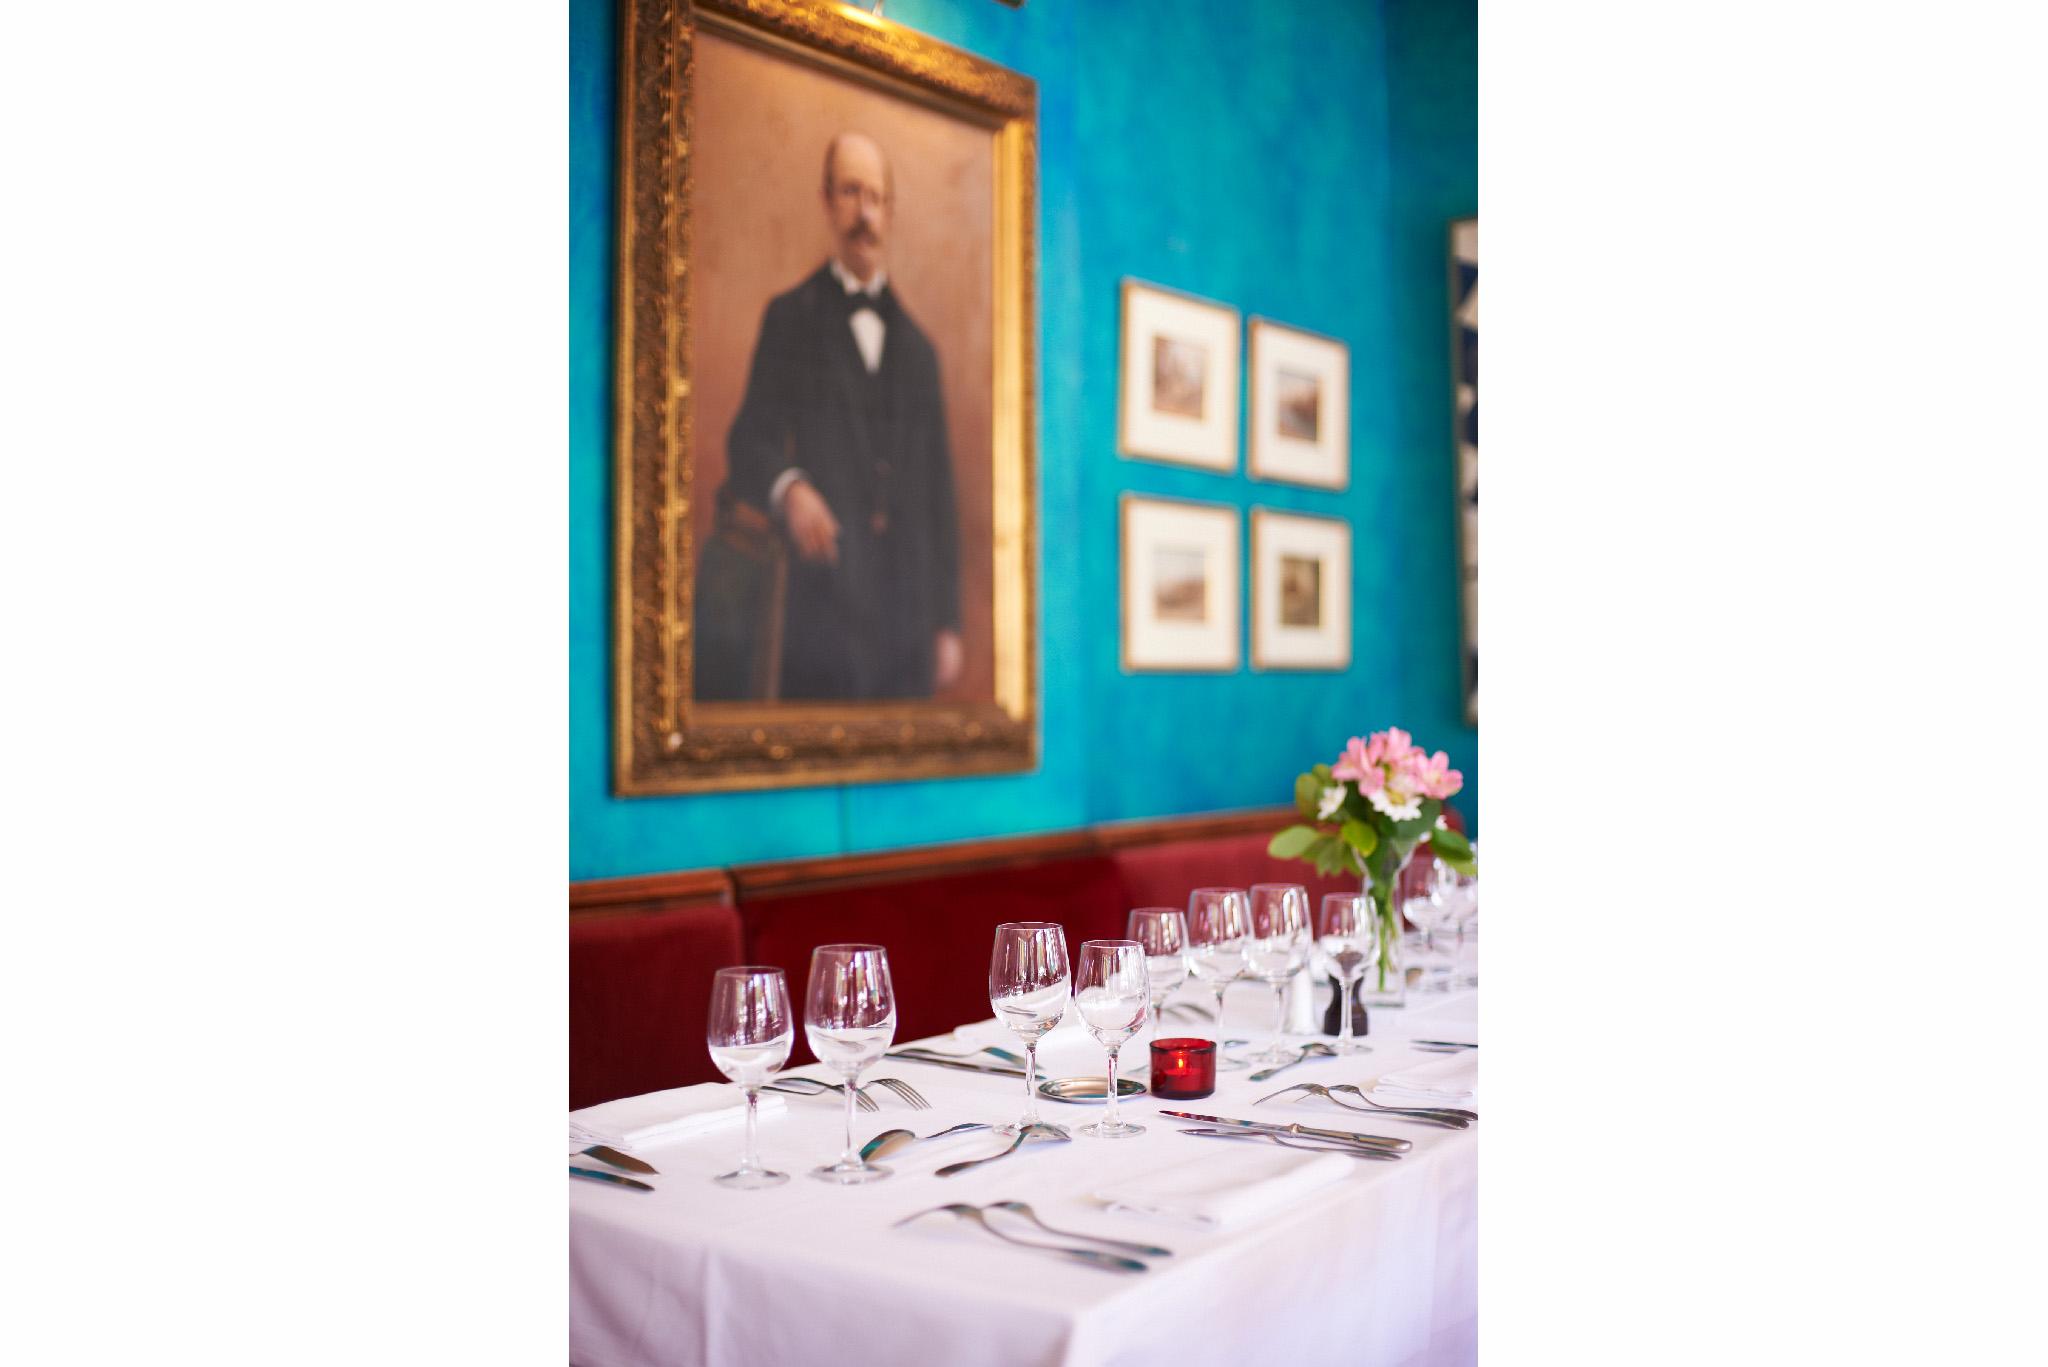 55_photographie_hotel_restaurant_nantes